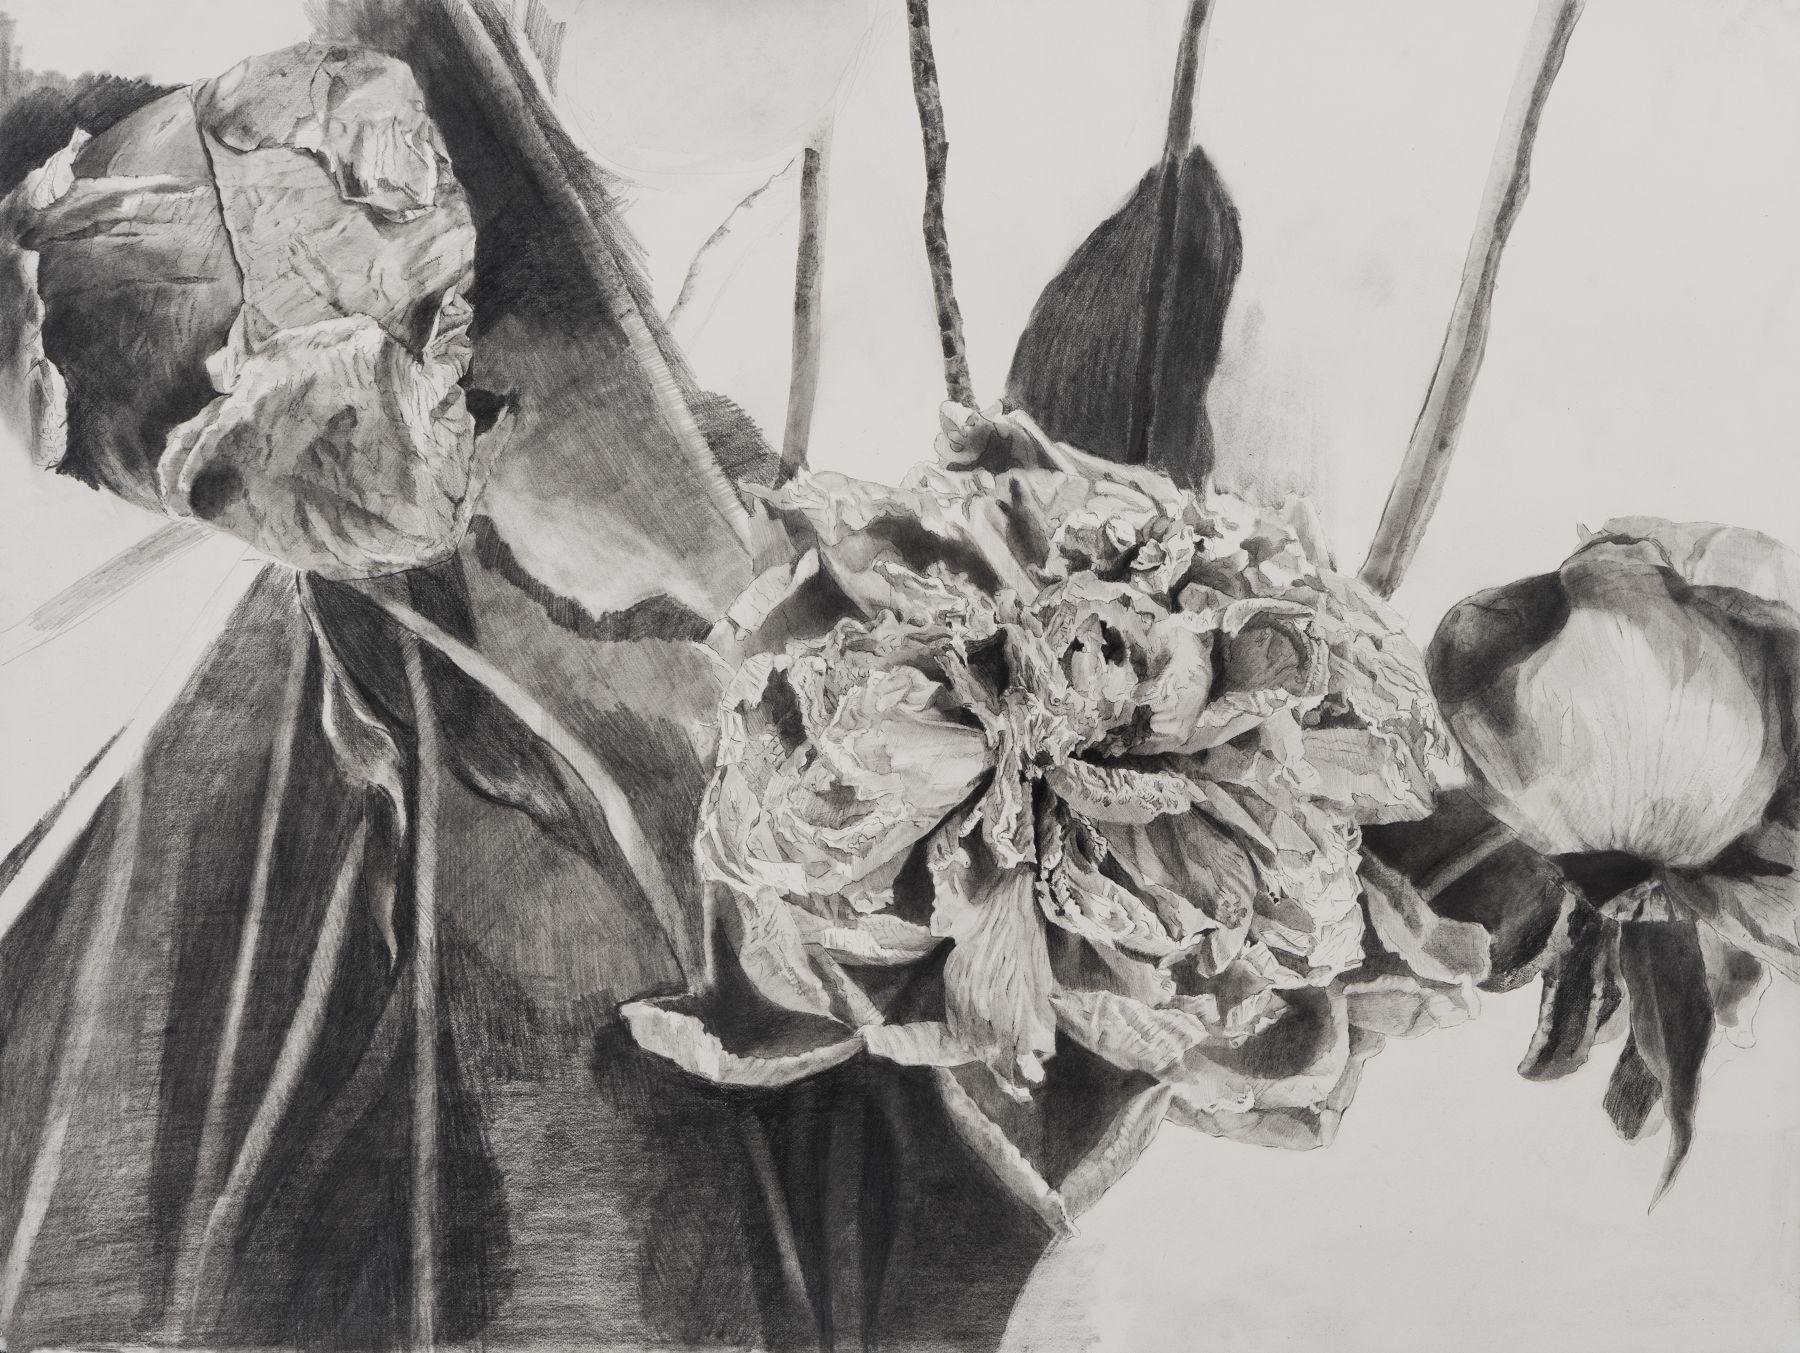 Dead Flowers, graphite on paper, 18 x 24 in, JR036